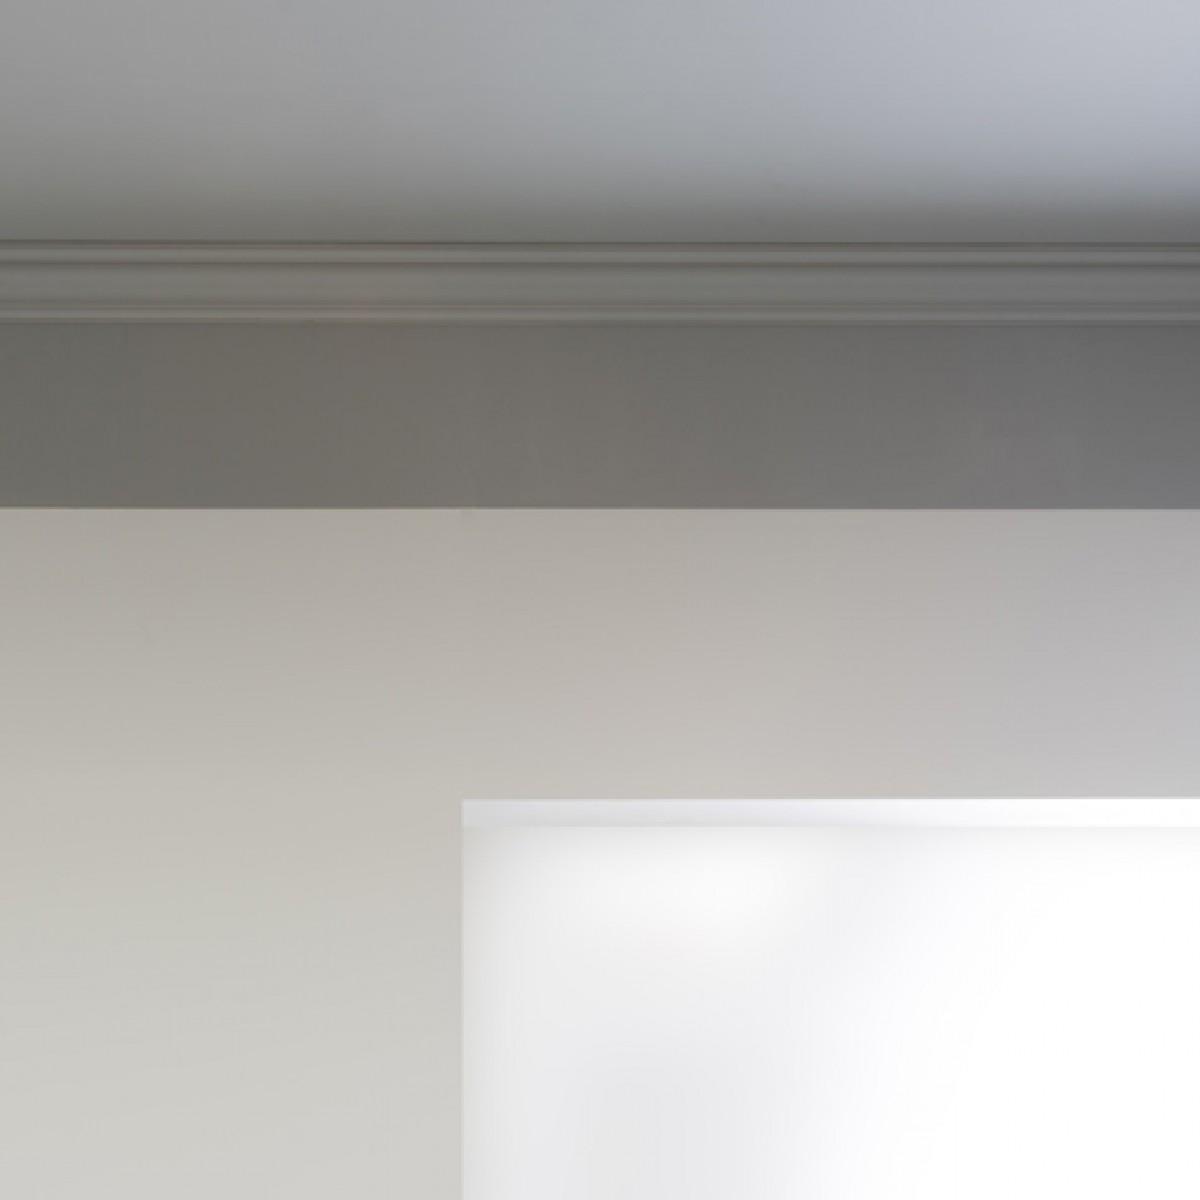 Cornisa AXXENT CX177, Dimensiuni: 200 X 6 X 7 cm, Orac Decor